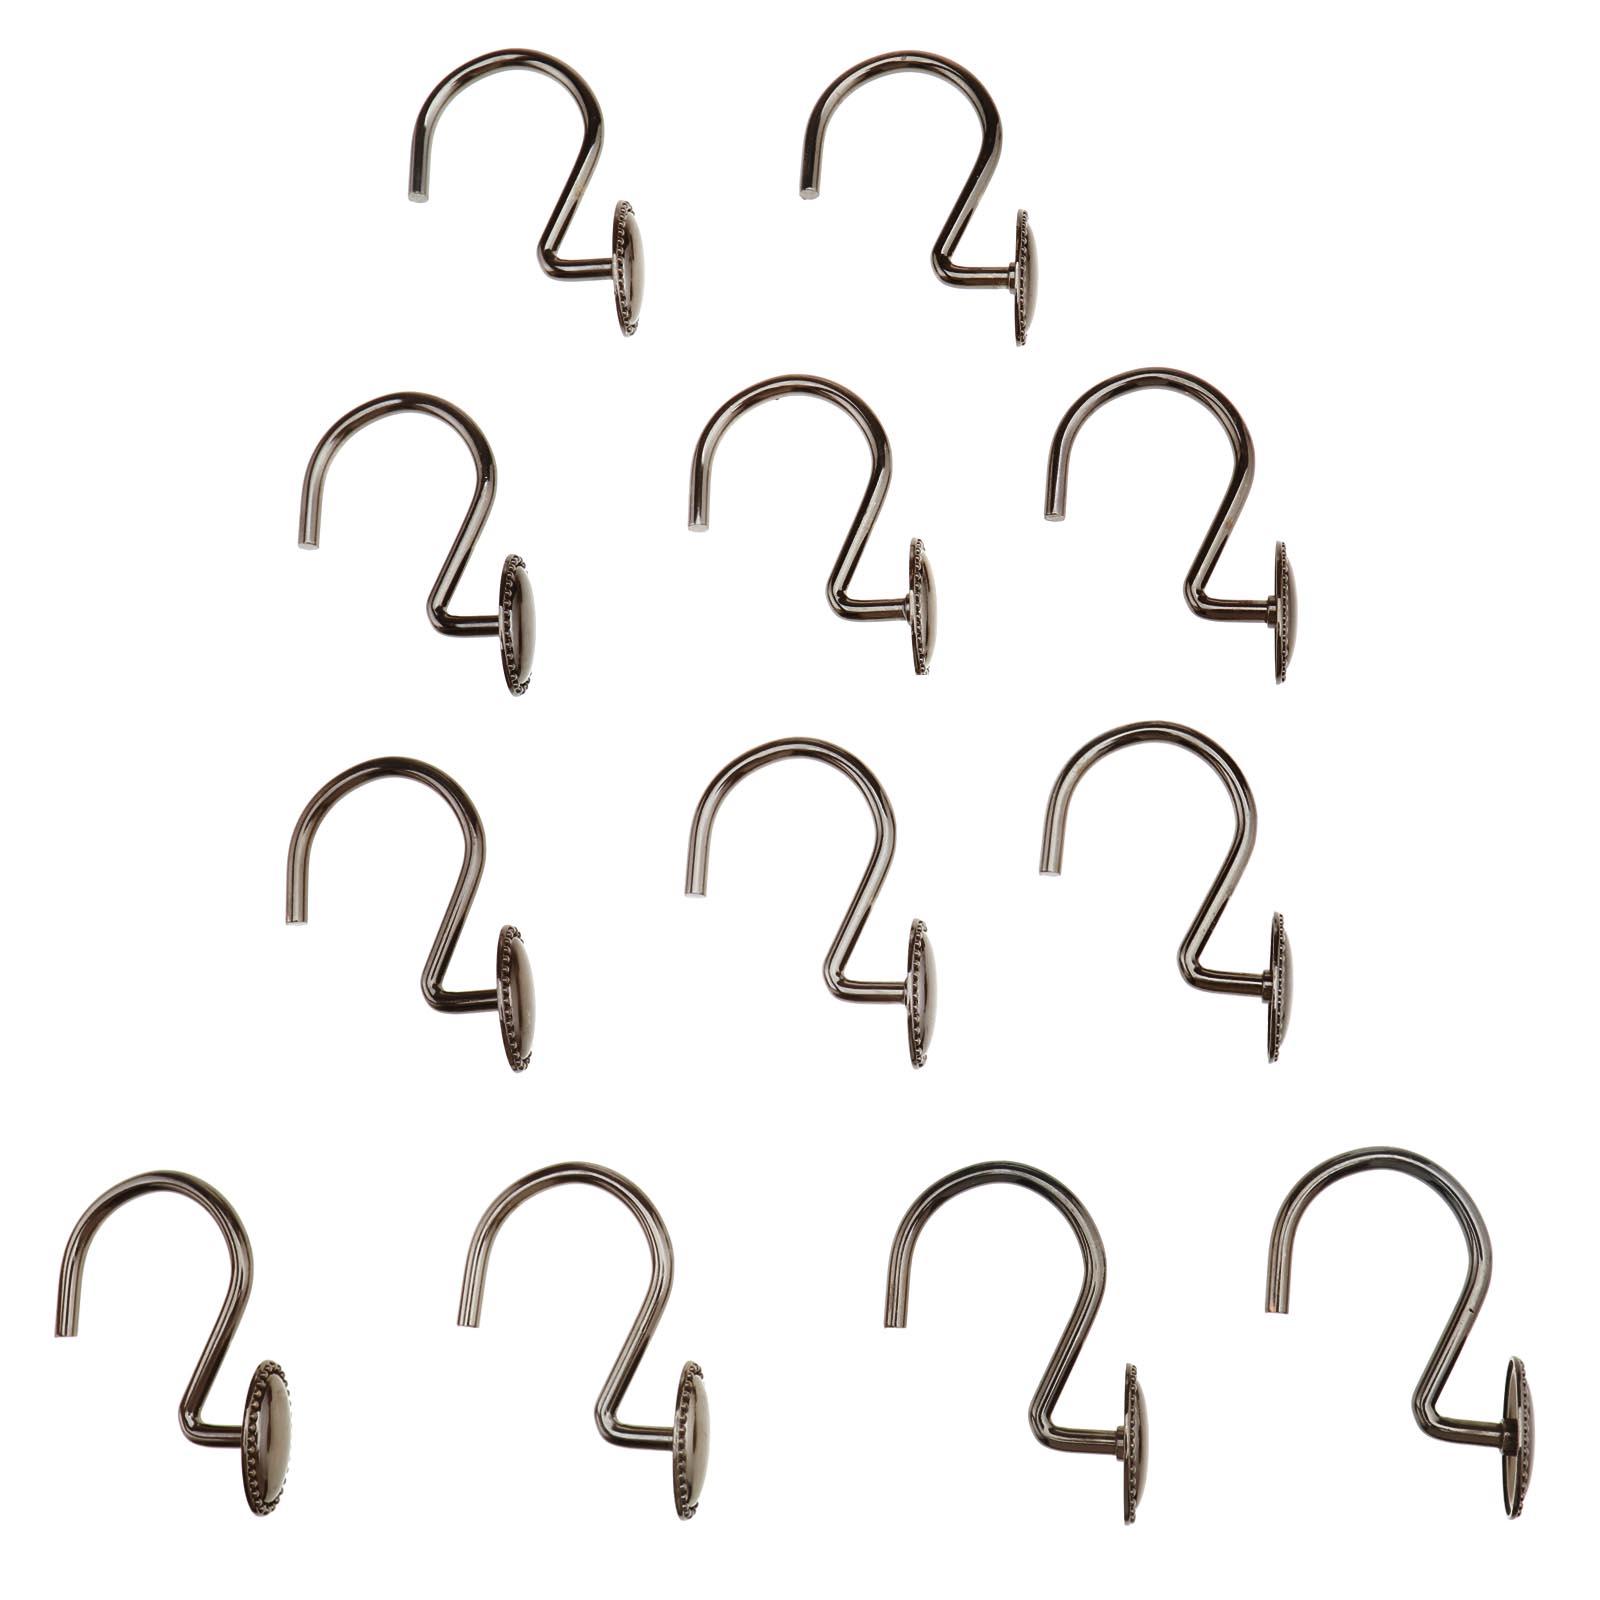 Details About Shower Curtain Hooks Rings Decorative Oval Retro Rust Proof Bathroom Bath 12pcs